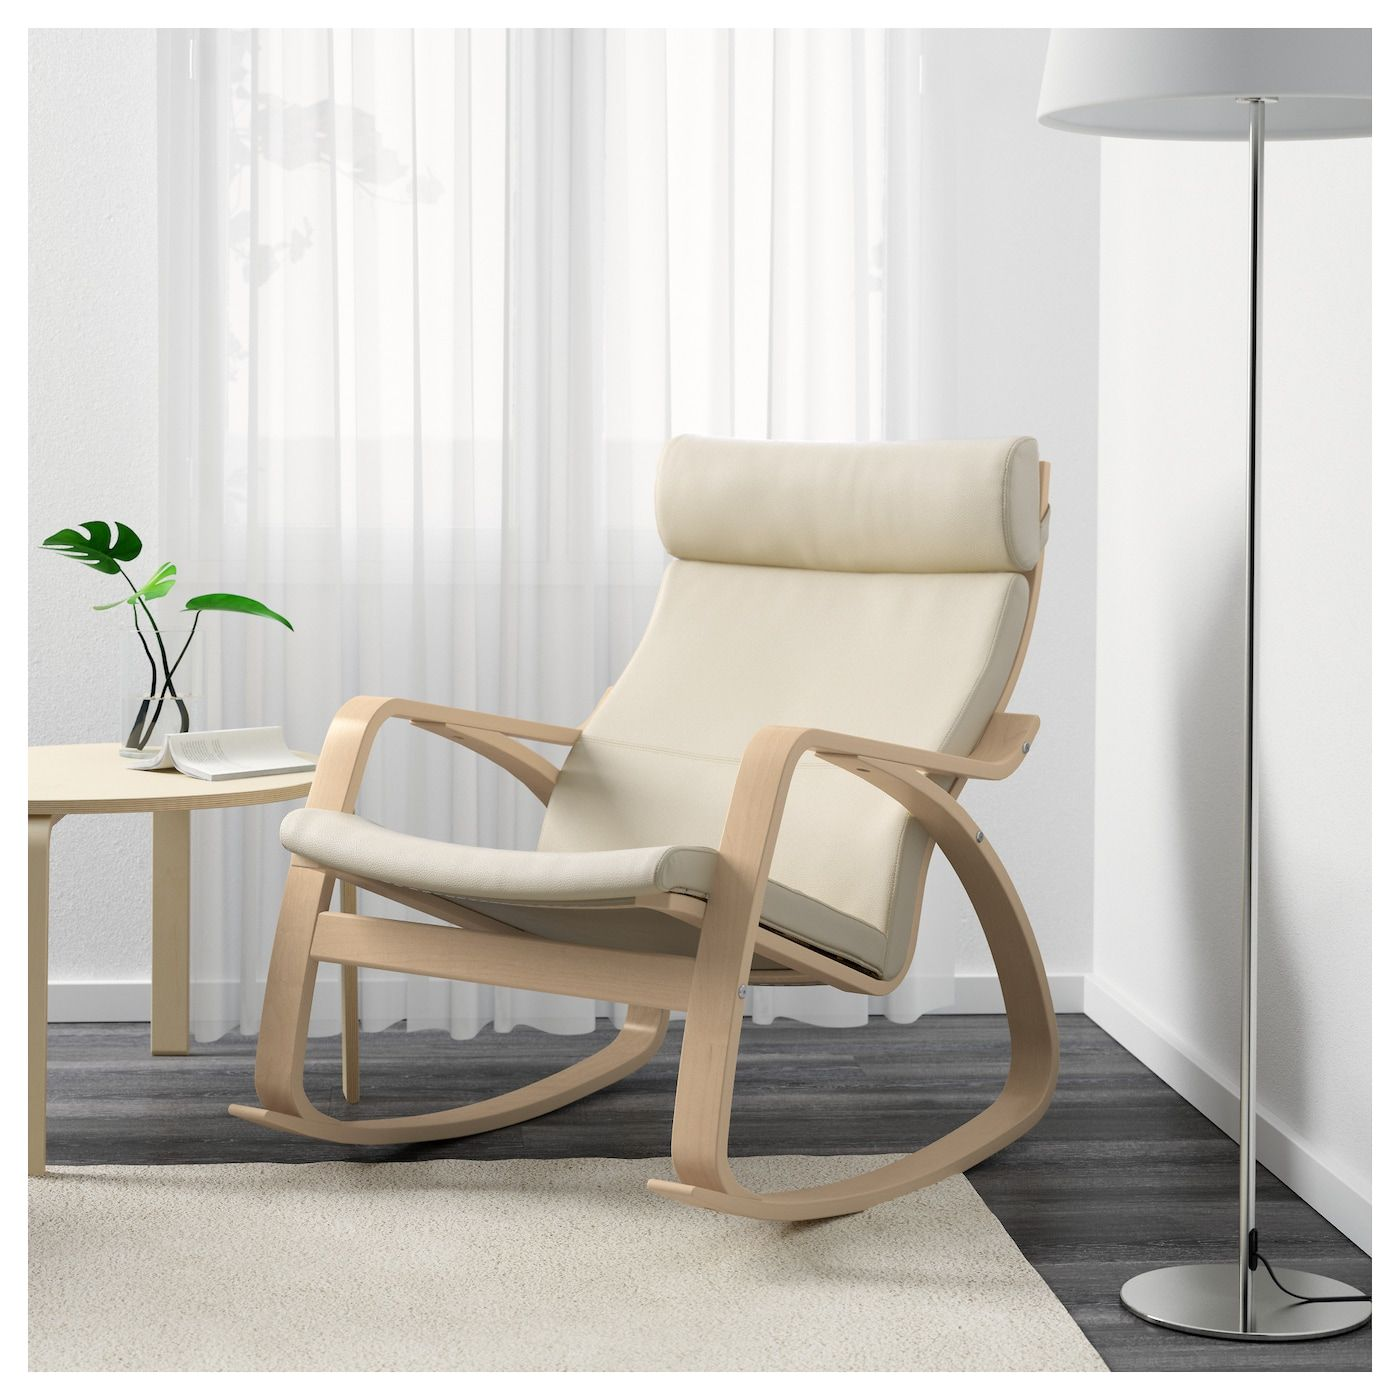 POÄNG Rocking chair, Glose off white, Width: 26 34